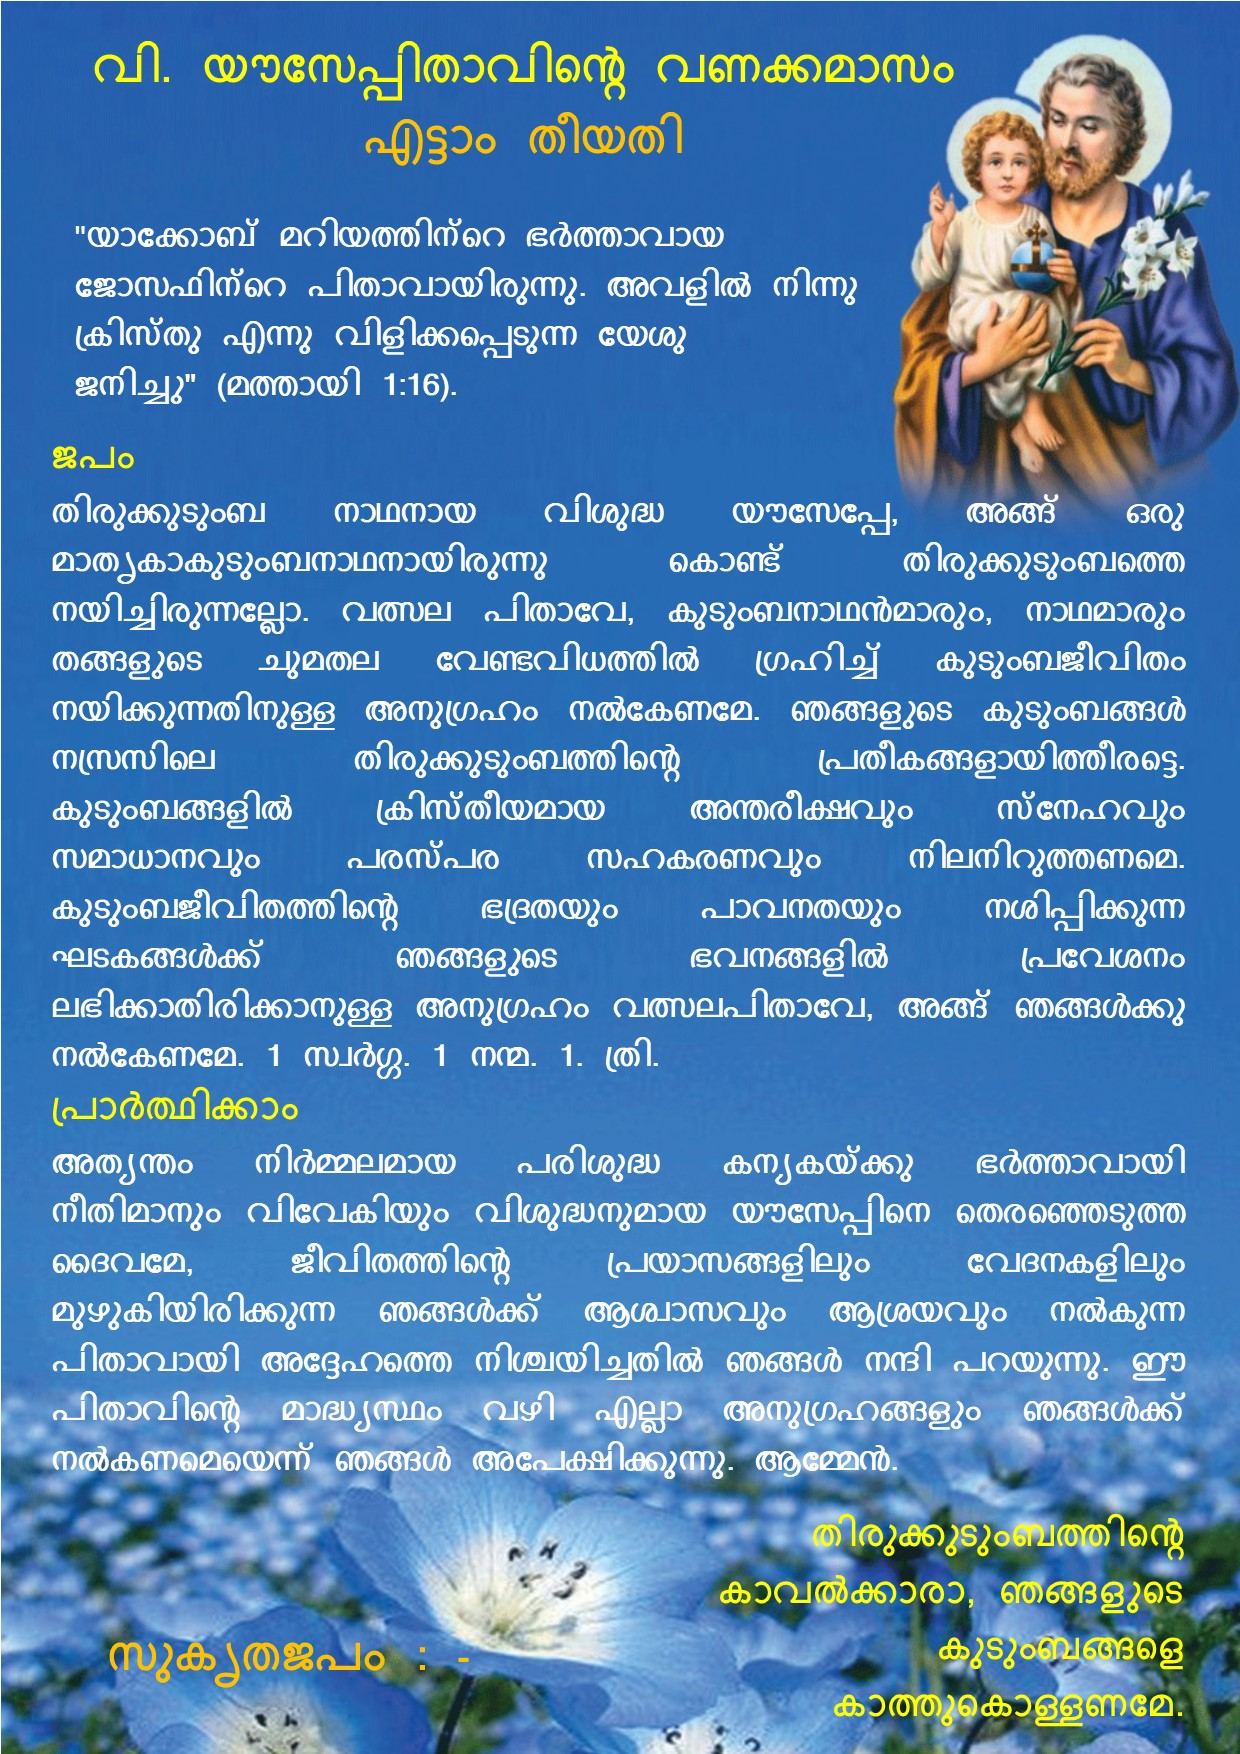 Vanakkamasam, St Joseph, March 08